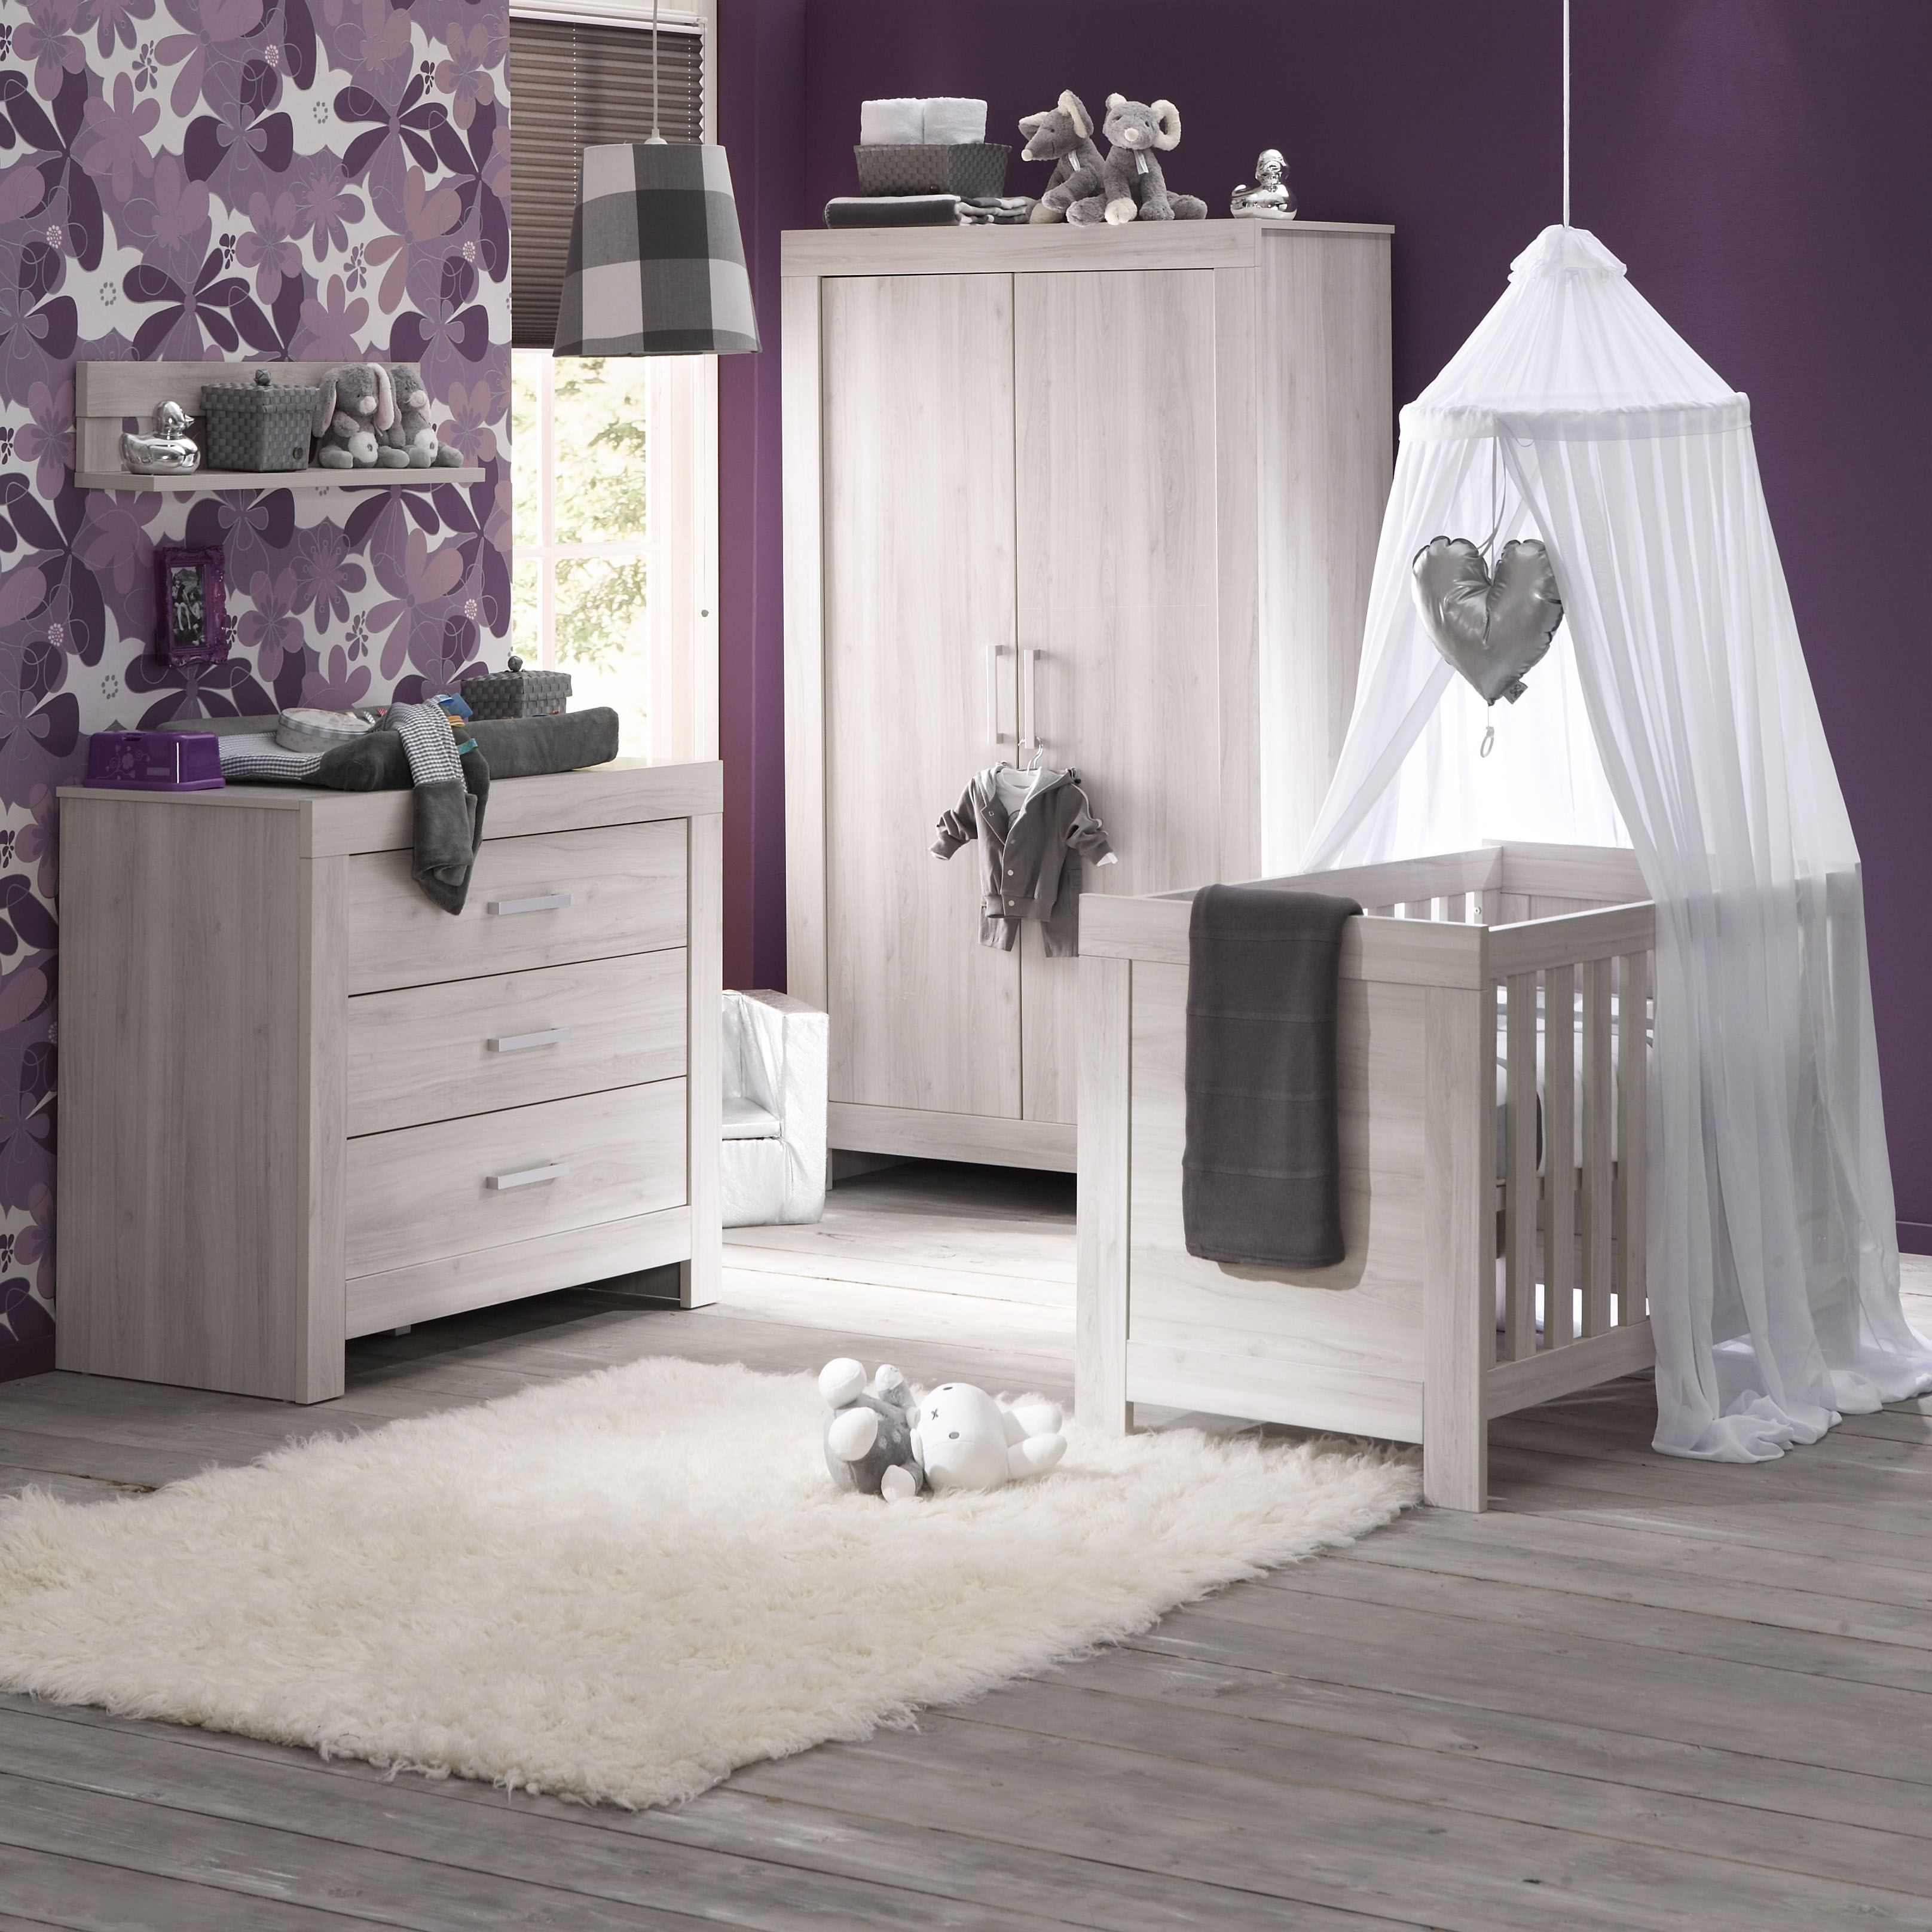 TWF Europe - Mobiliario Infantil - Babyroom - Babykamer - Conjunto ...